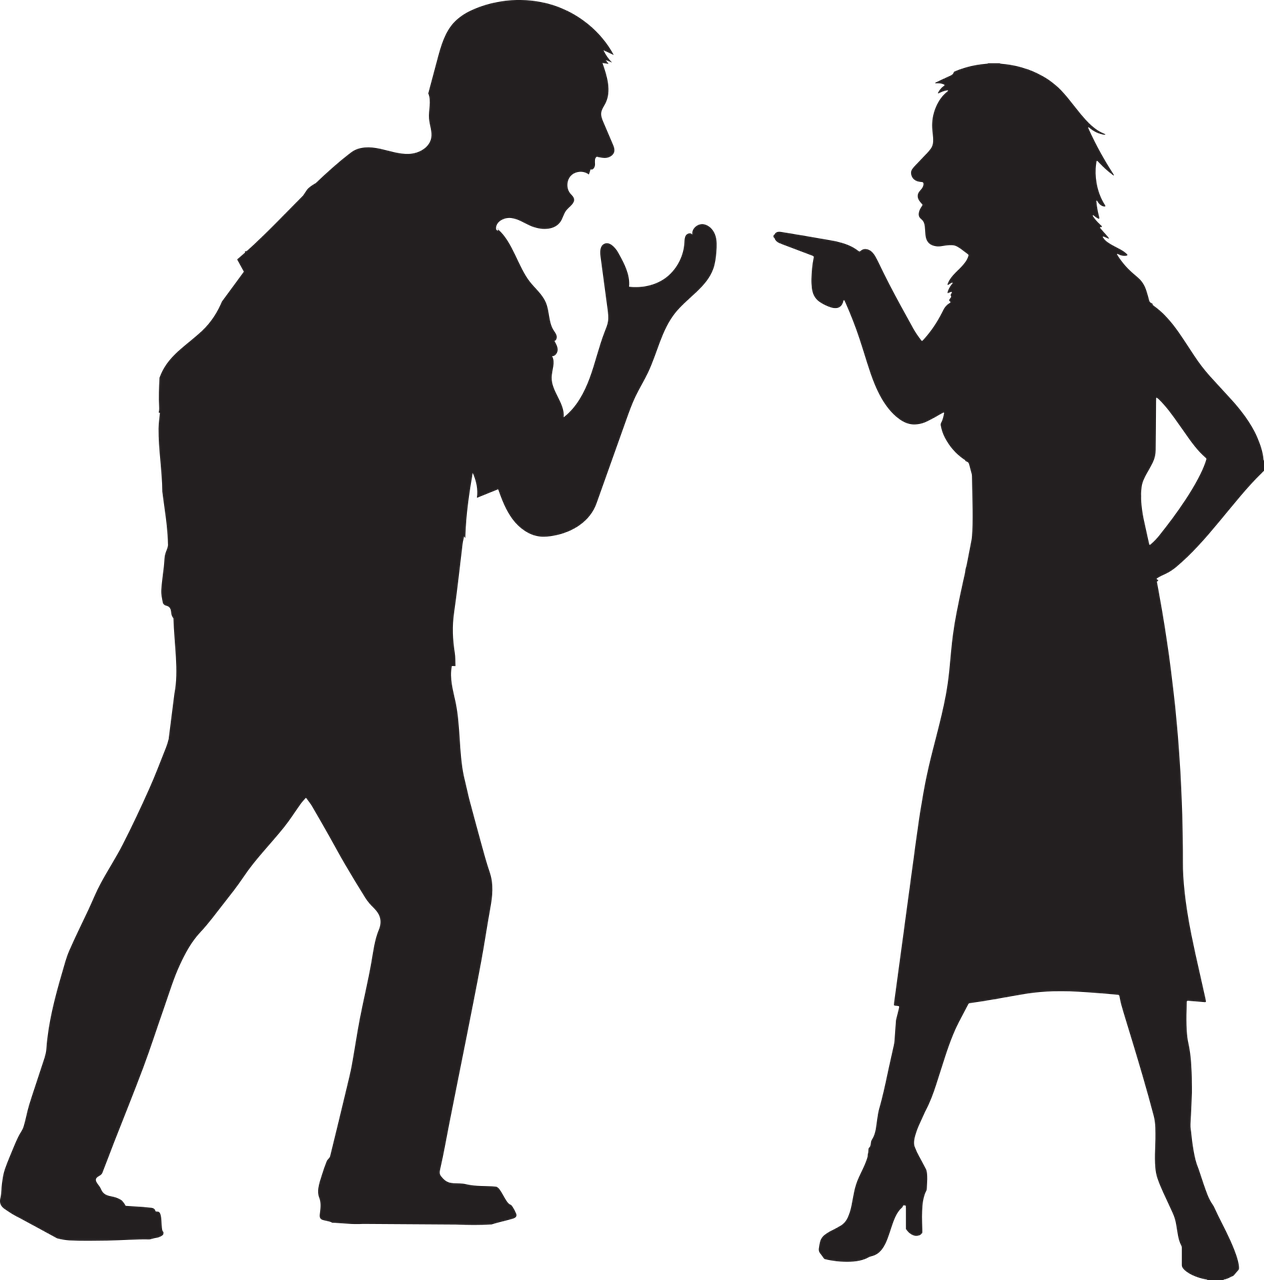 Wege-Machtkampf-Beziehung-ruinieren